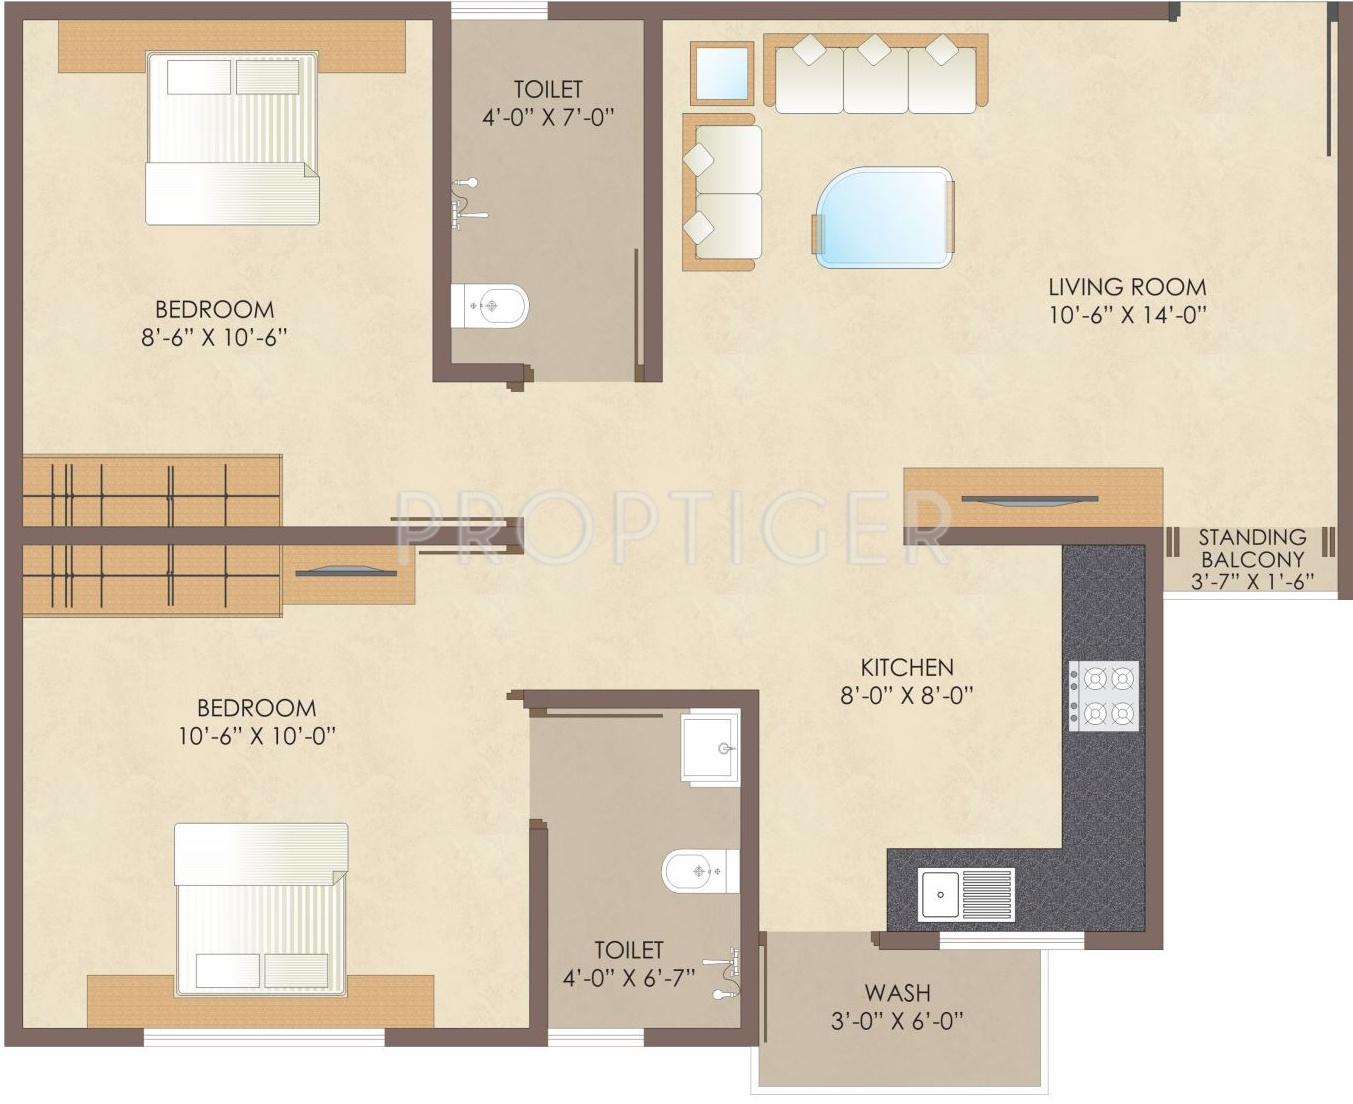 900 Sq Ft Apartment Floor Plan – Villas At Fortune Place Floor Plan